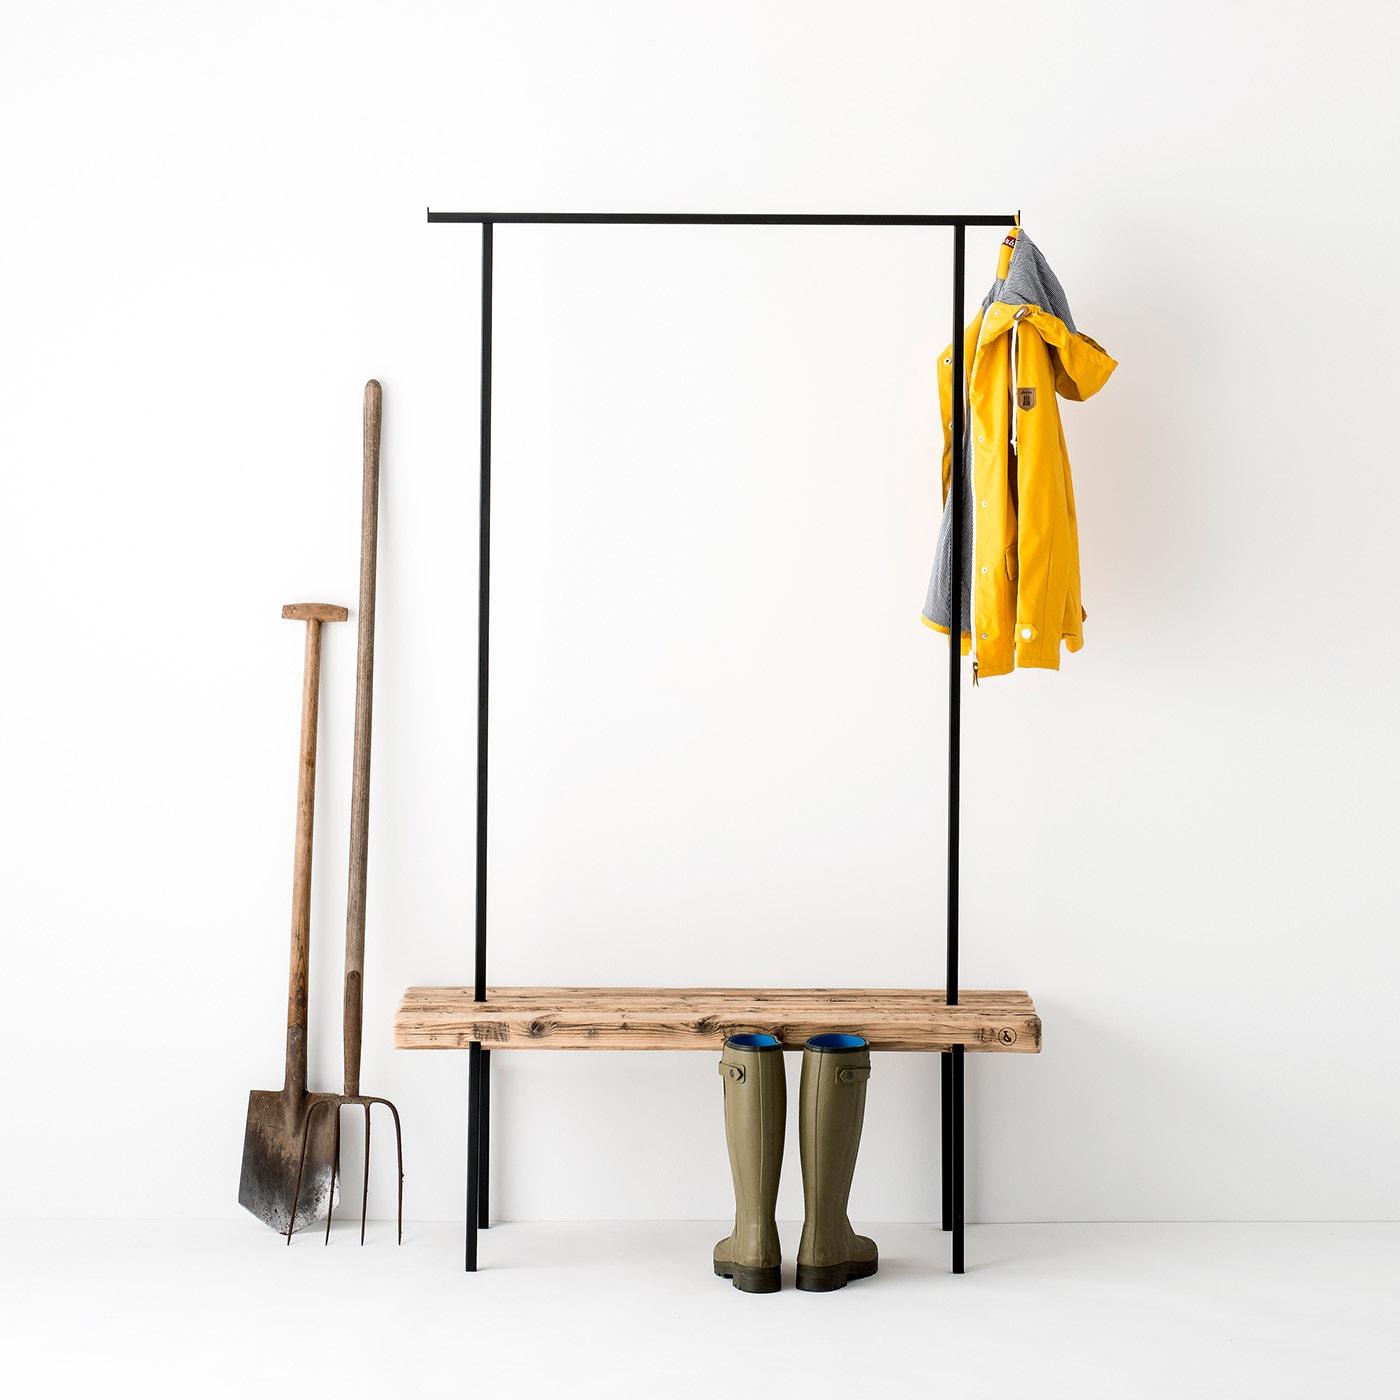 garderobe 01 altholz massivholz braun kleiderstange metall schwarz weldco 03